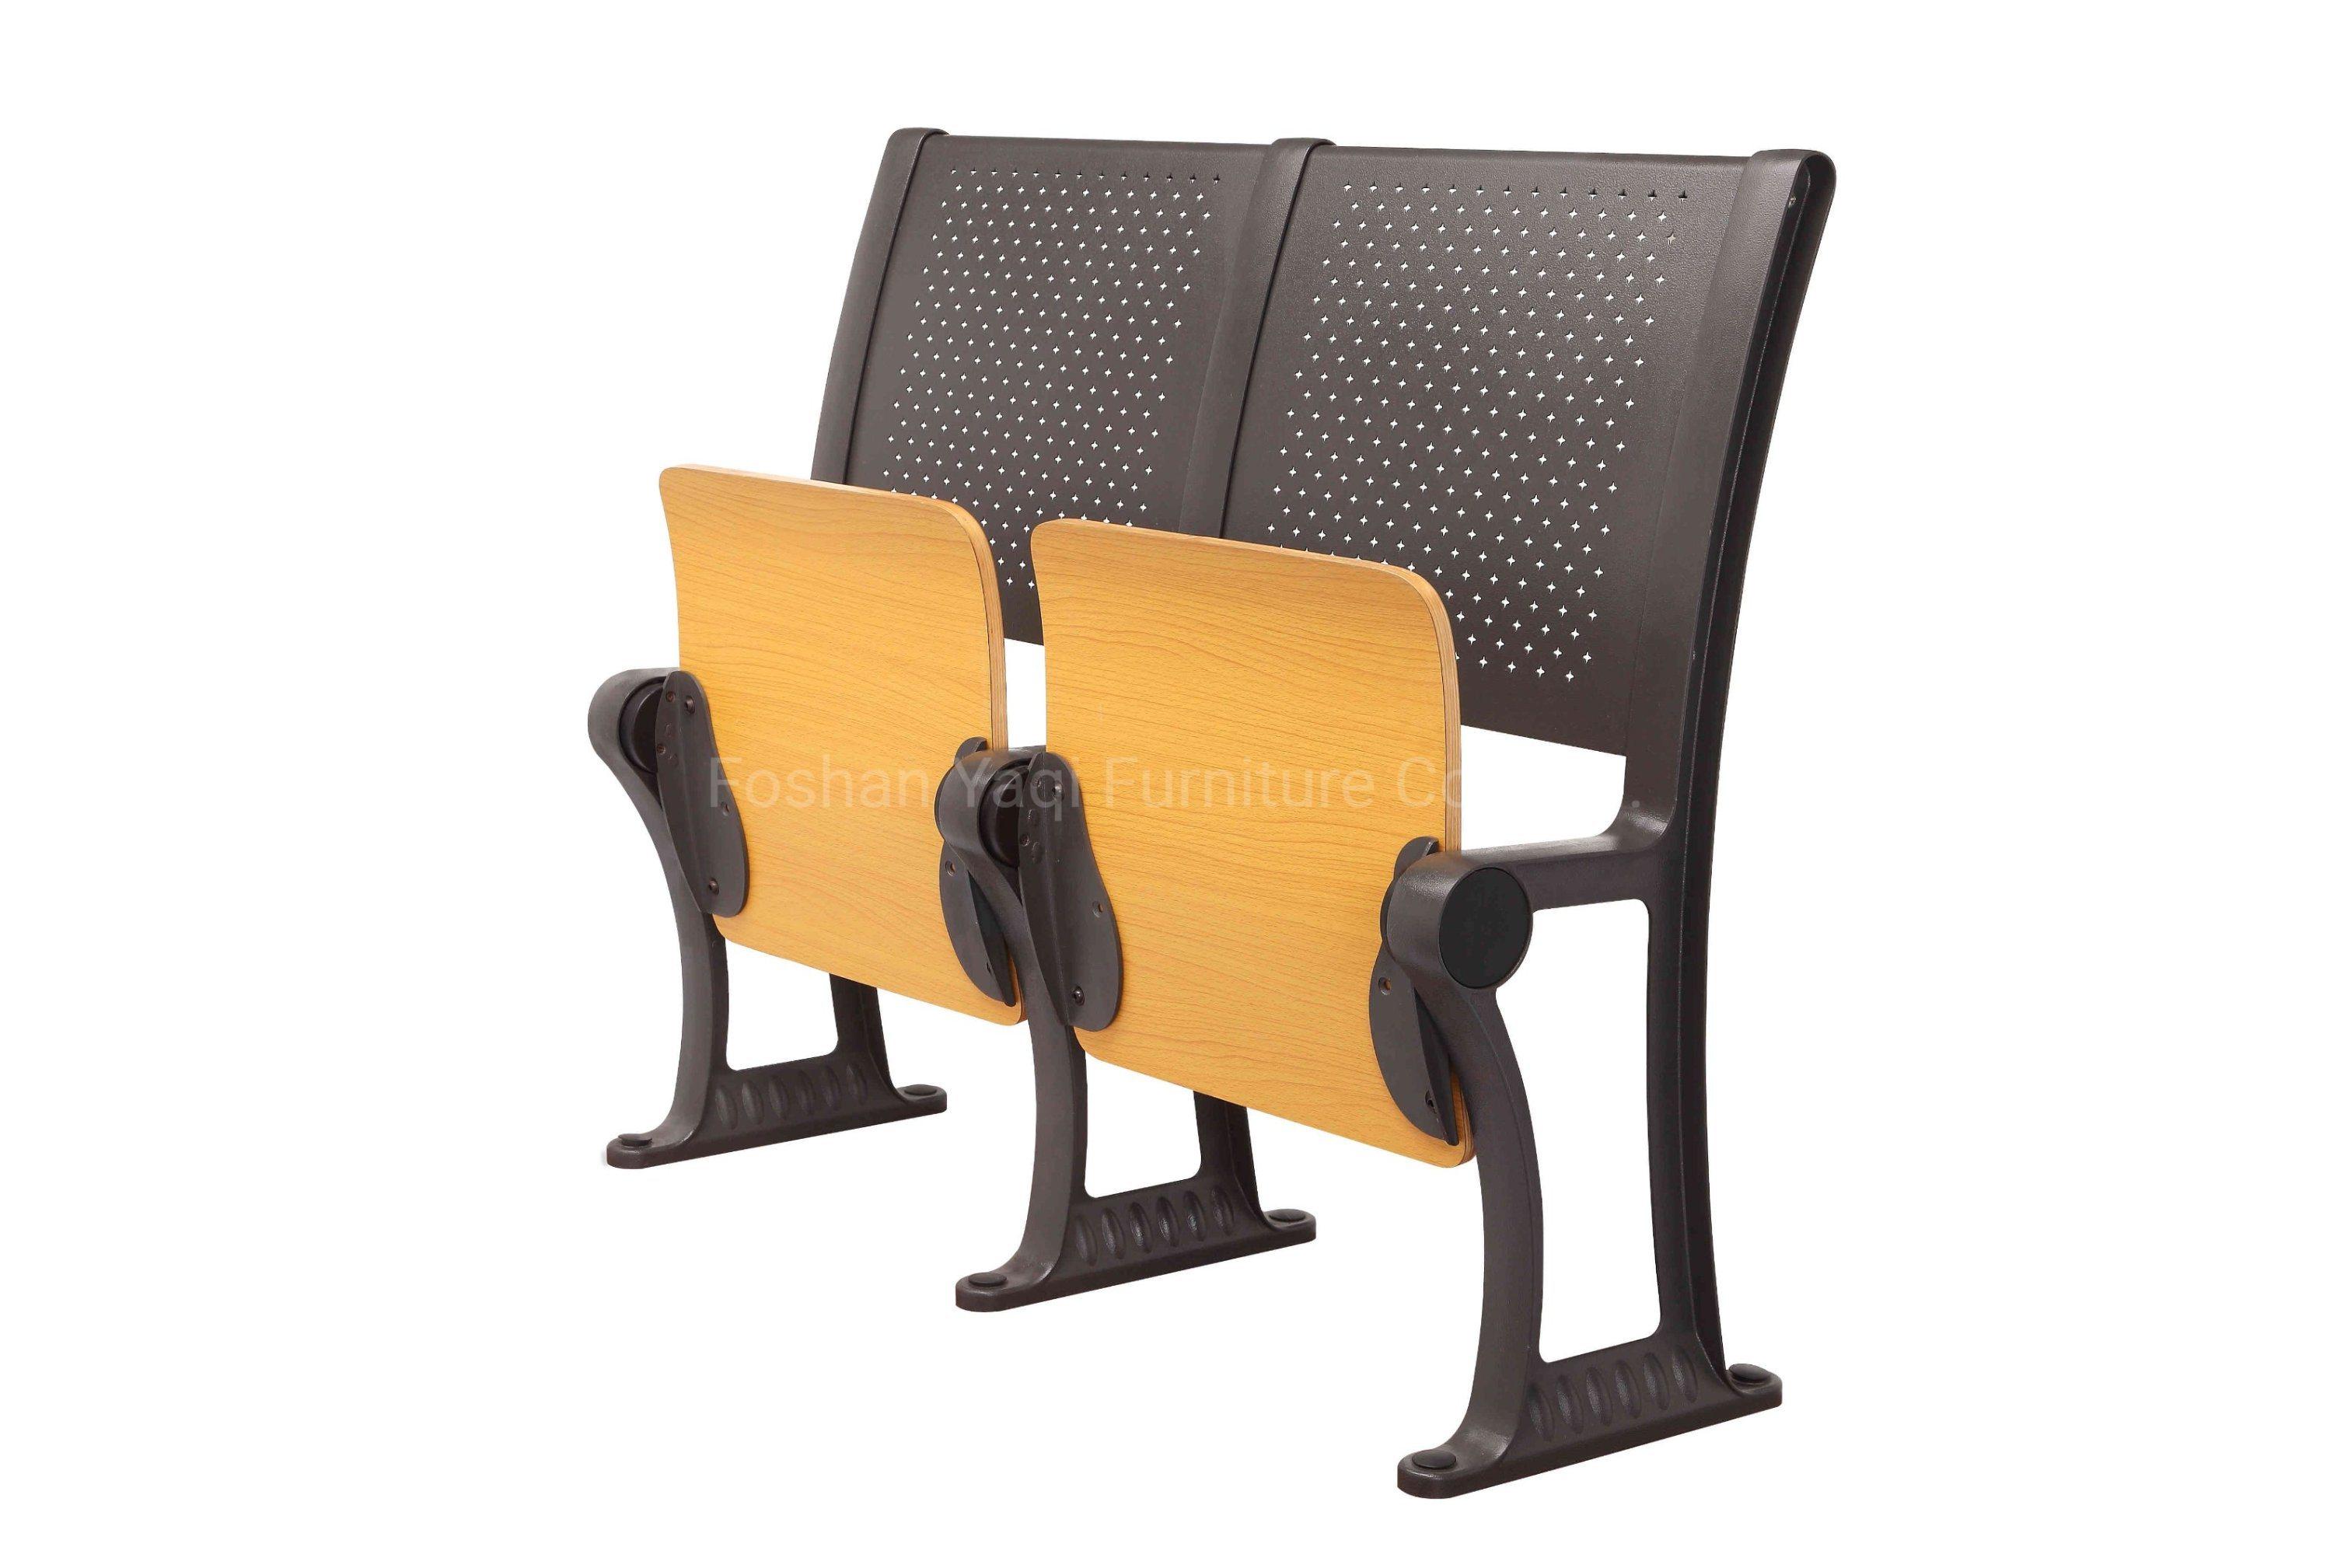 [Hot Item] Public Training School Classroom Lecture Hall University Student  Desk Chair (YA-X42)